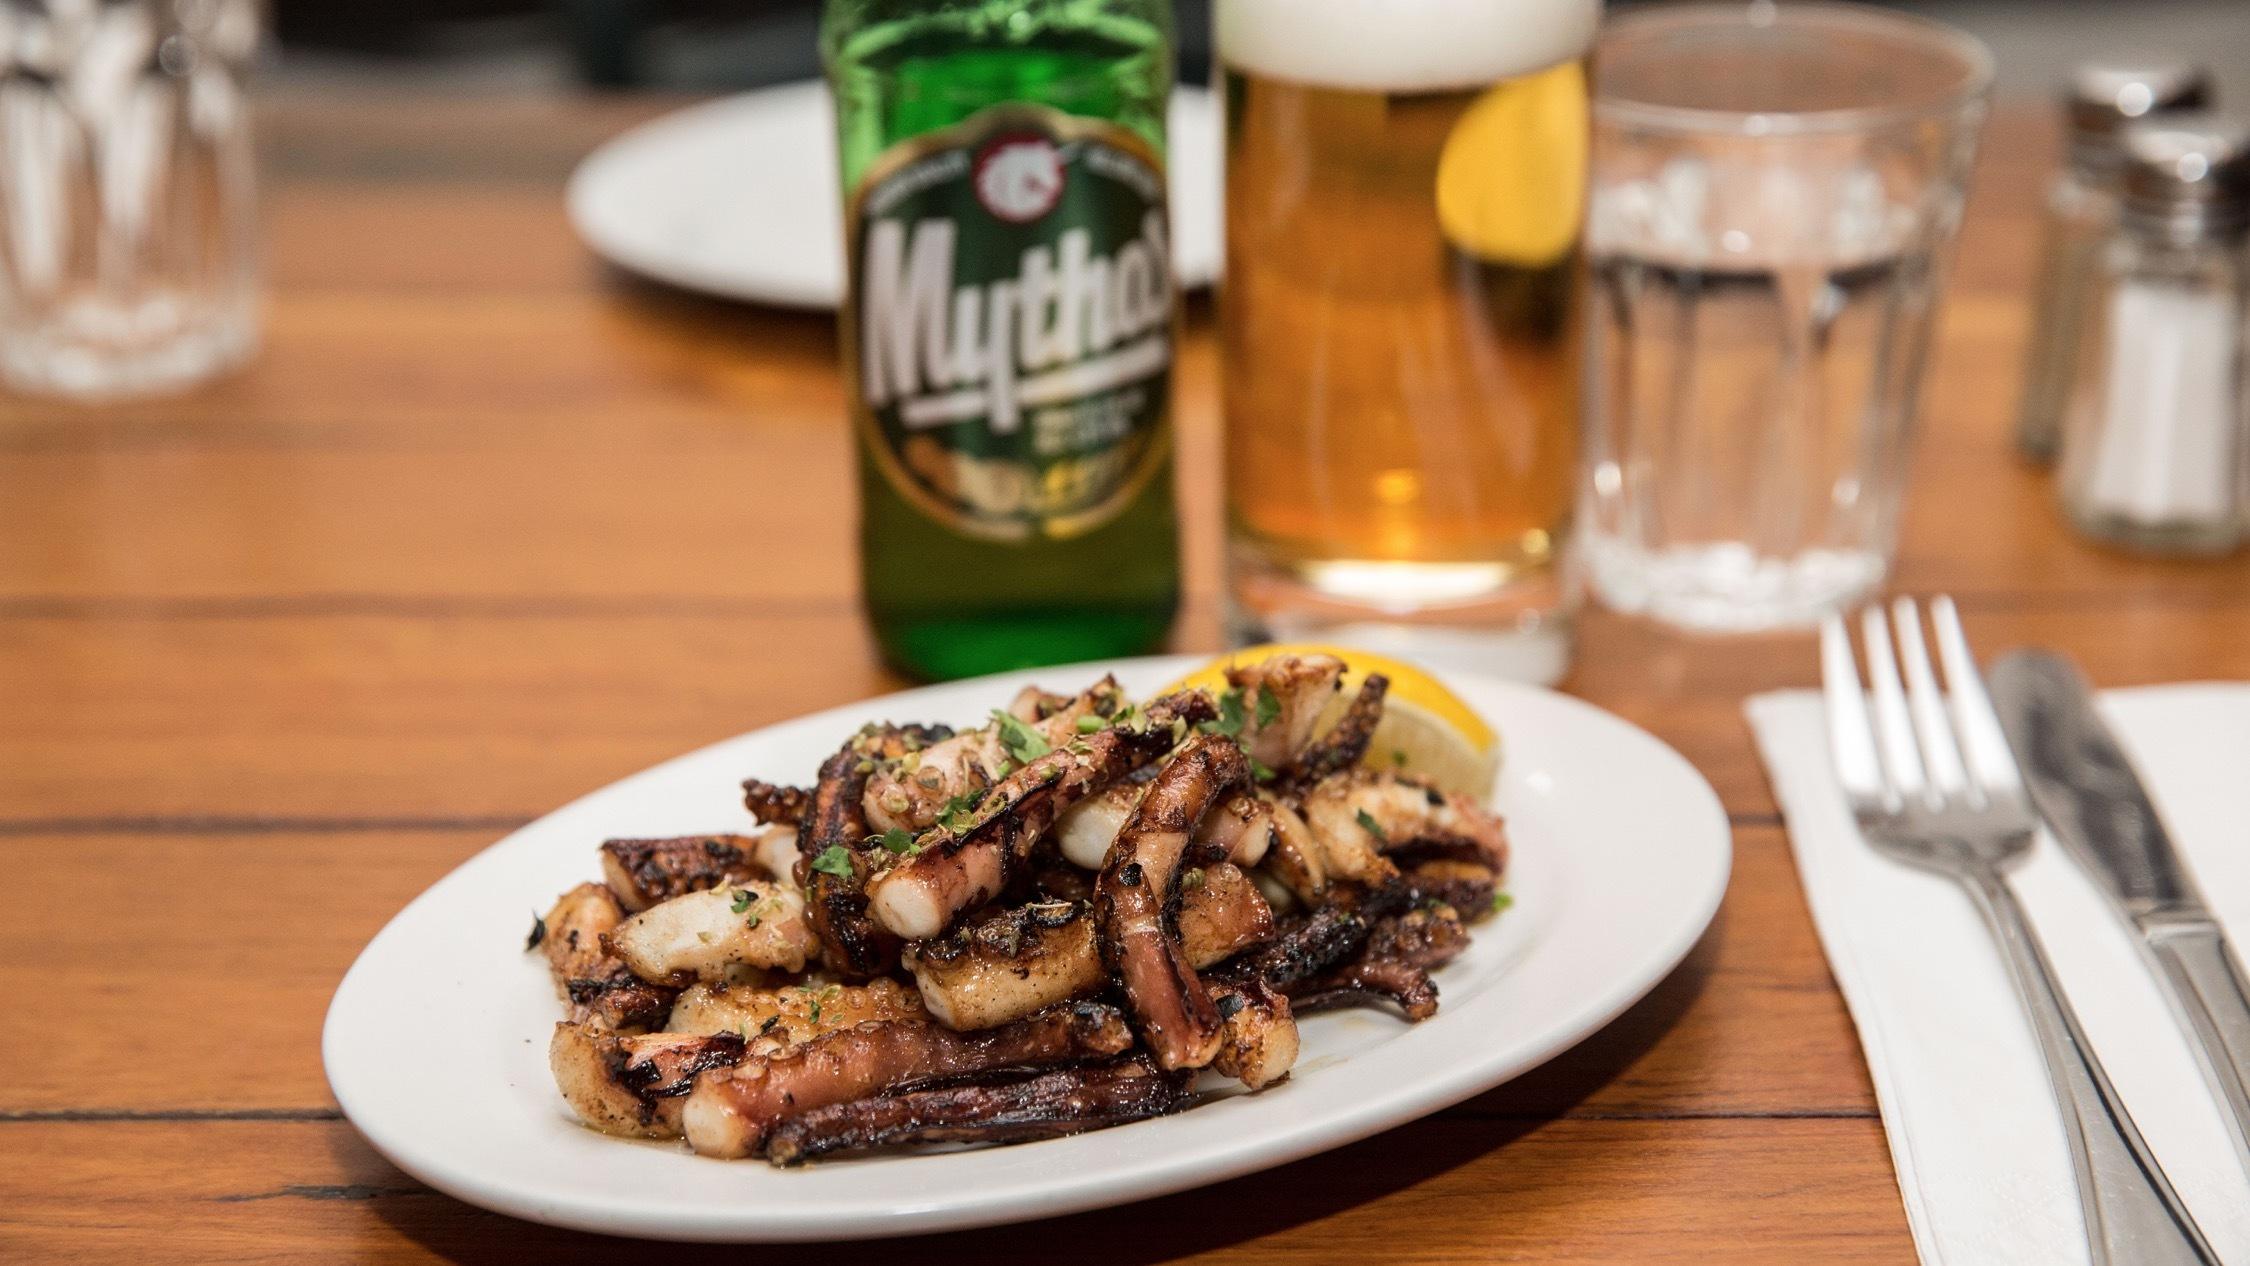 Octopus at Steki Taverna